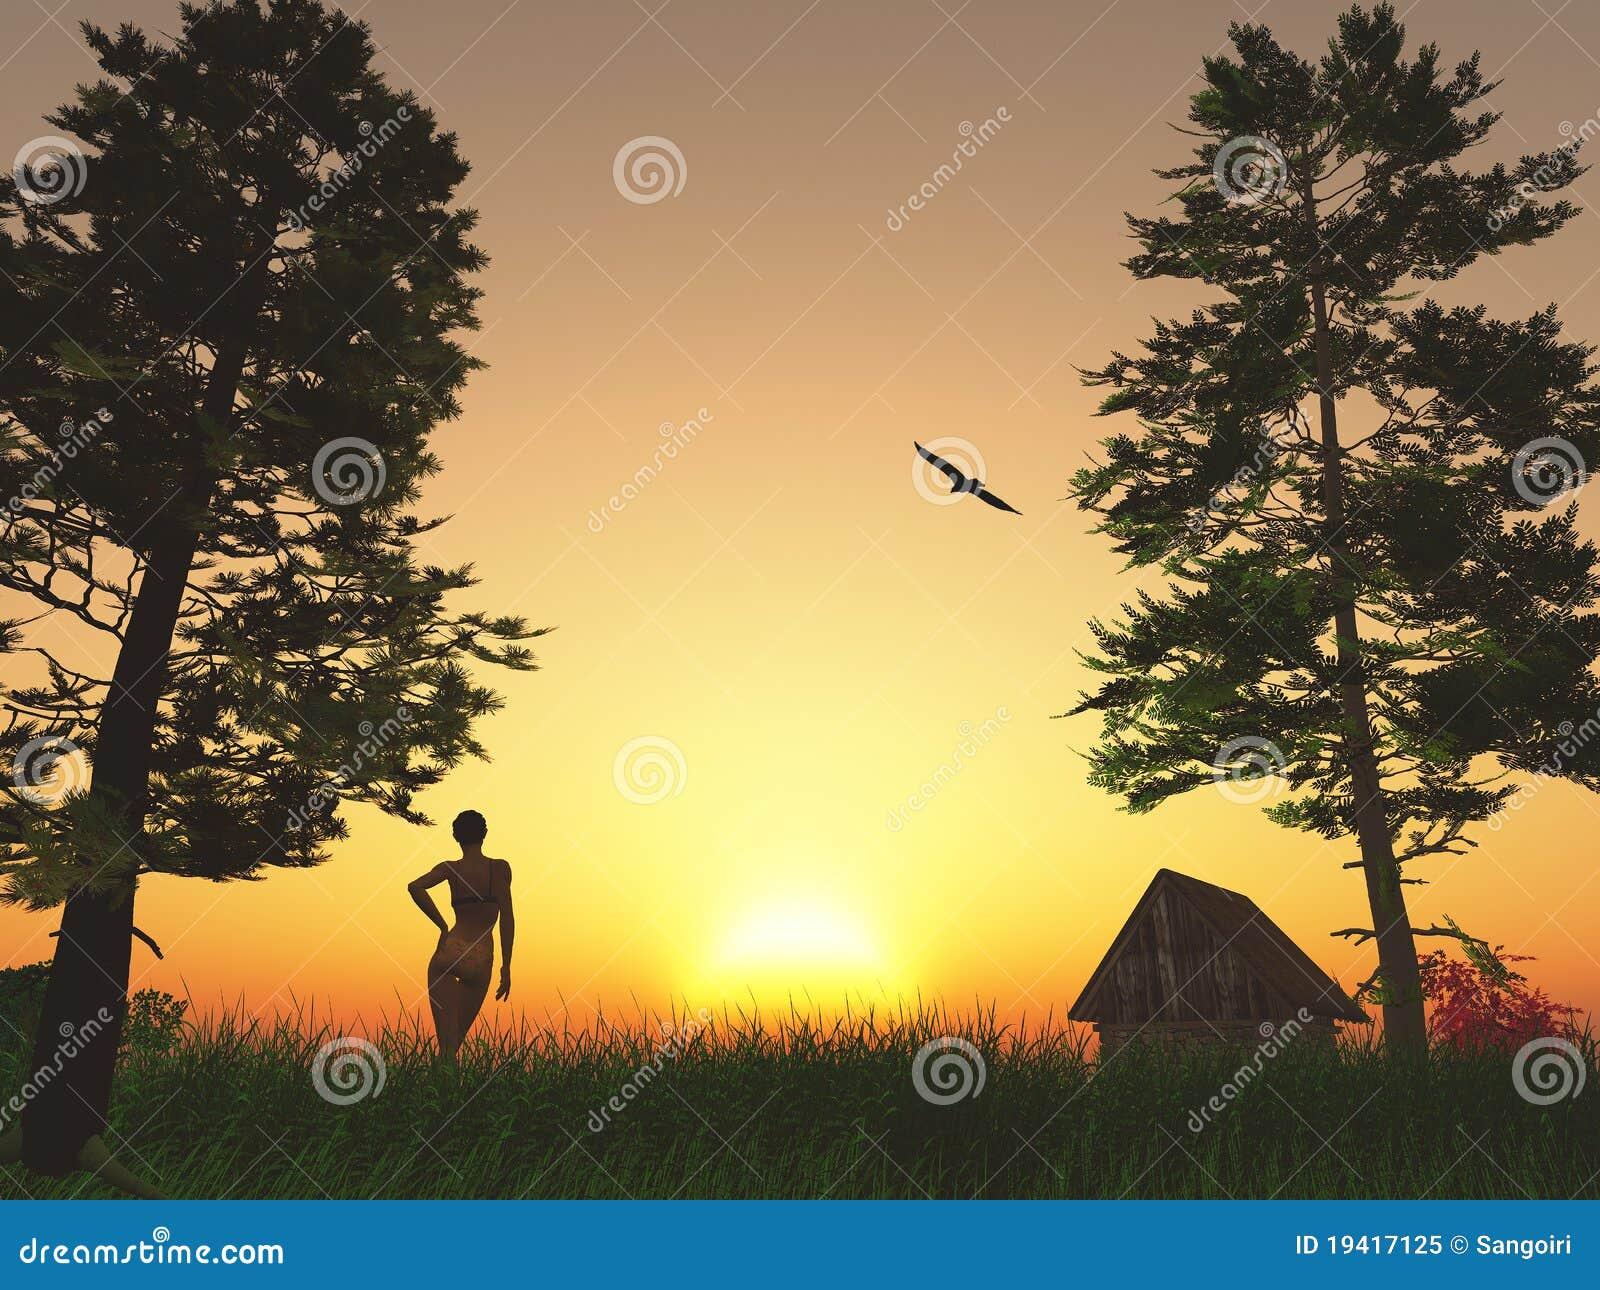 Shortstraw Good Morning Sunshine Zip : Good morning sunshine free ccbittorrent